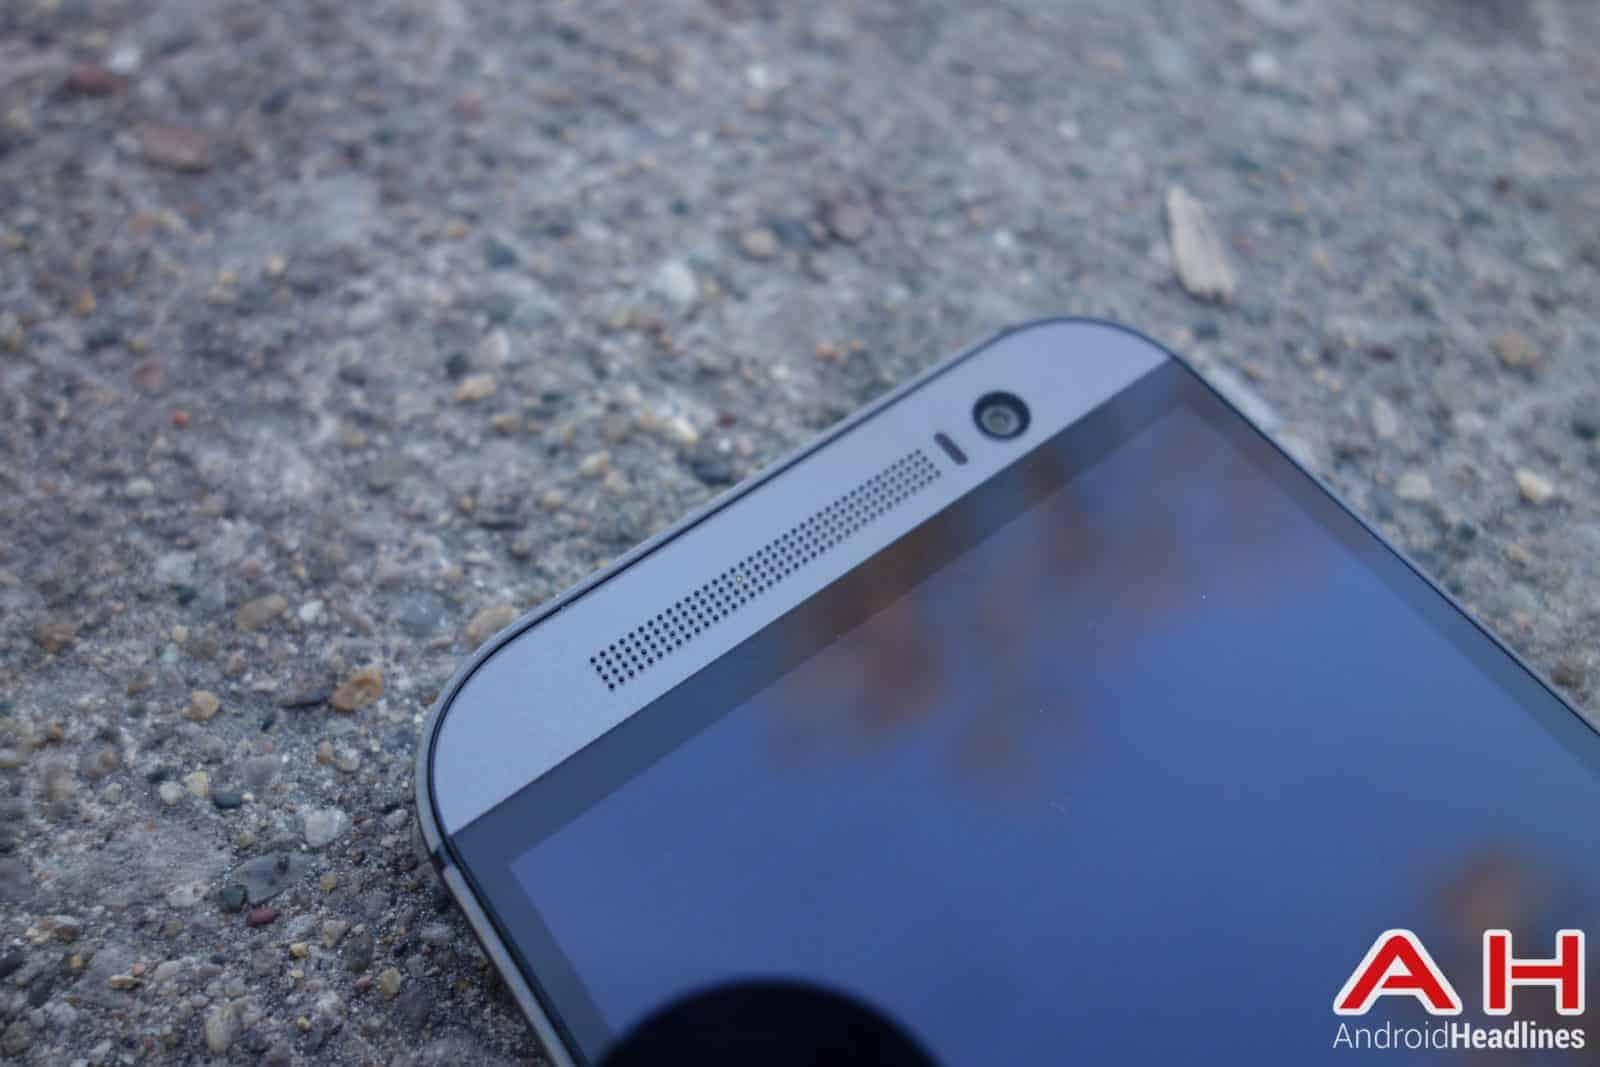 HTC-One-M8 (77)